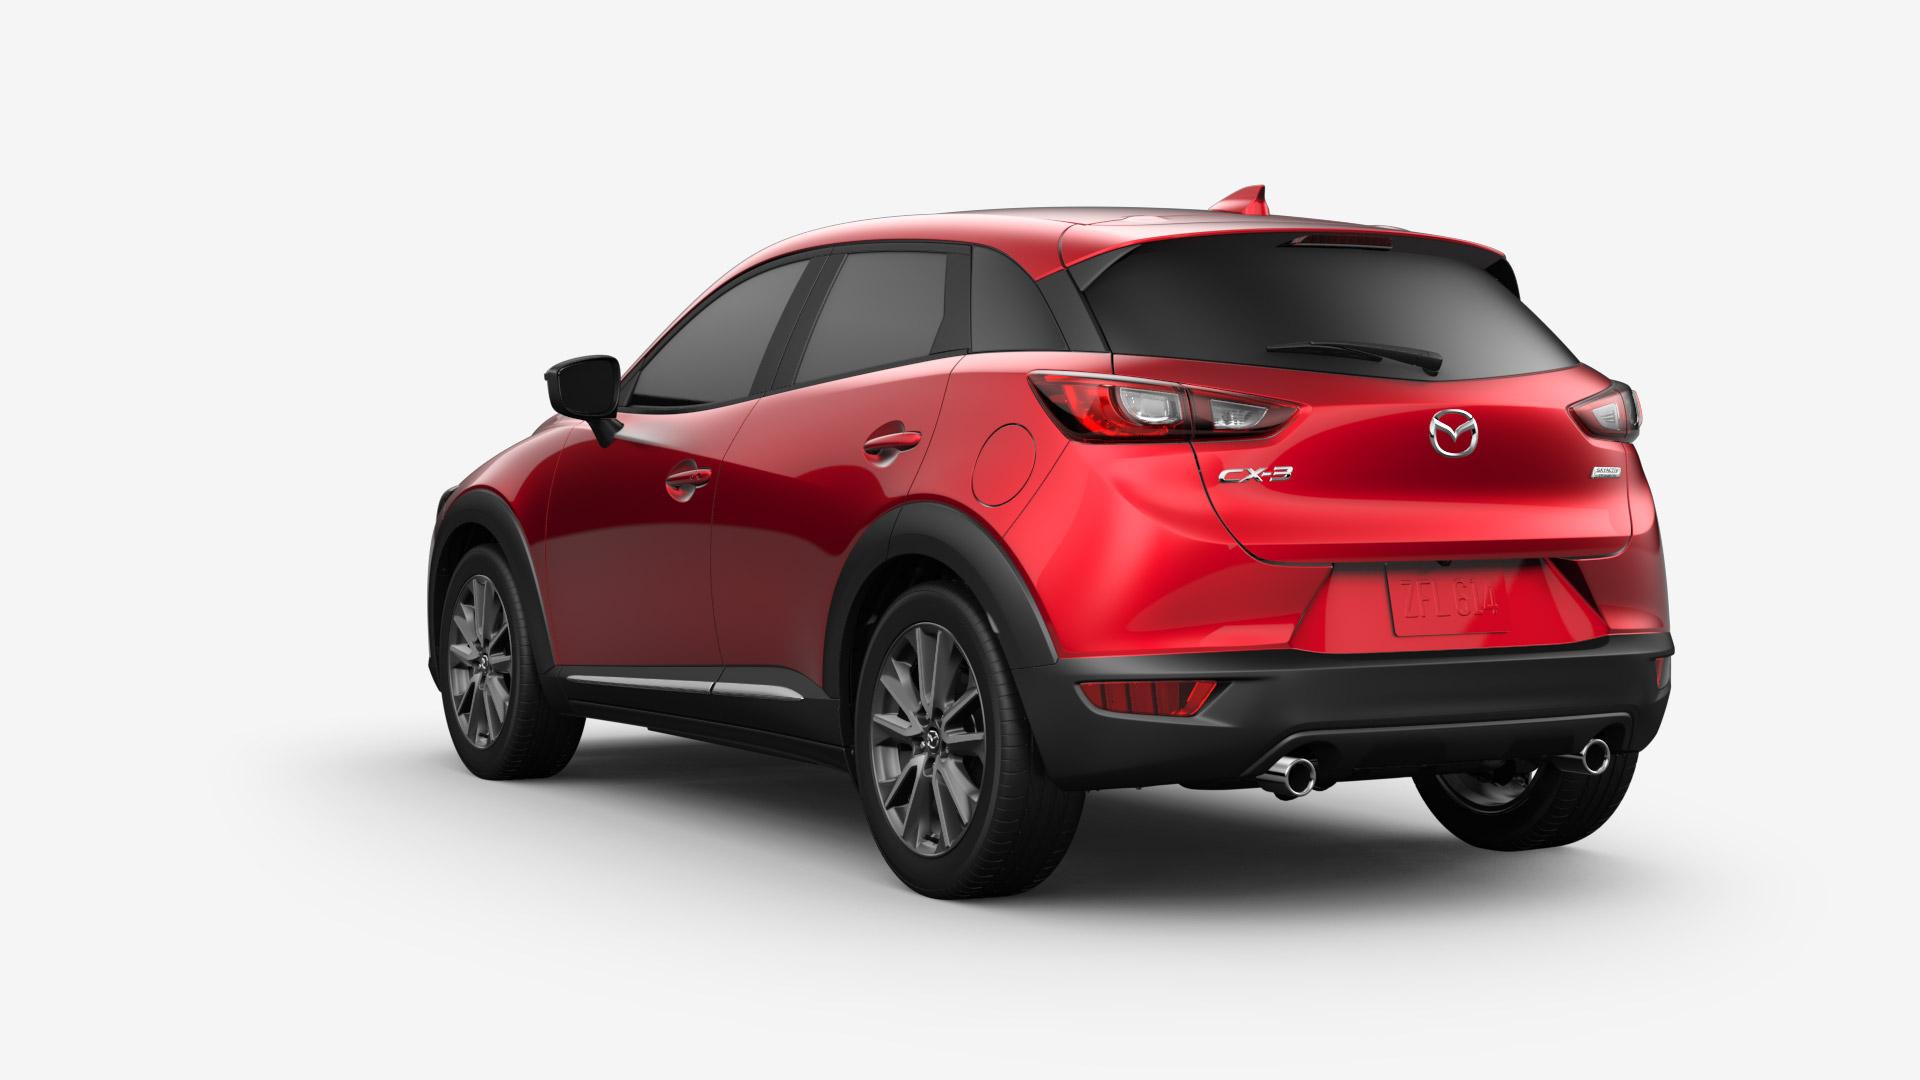 my18_cx3_gt_41v_soul_red_car-0008